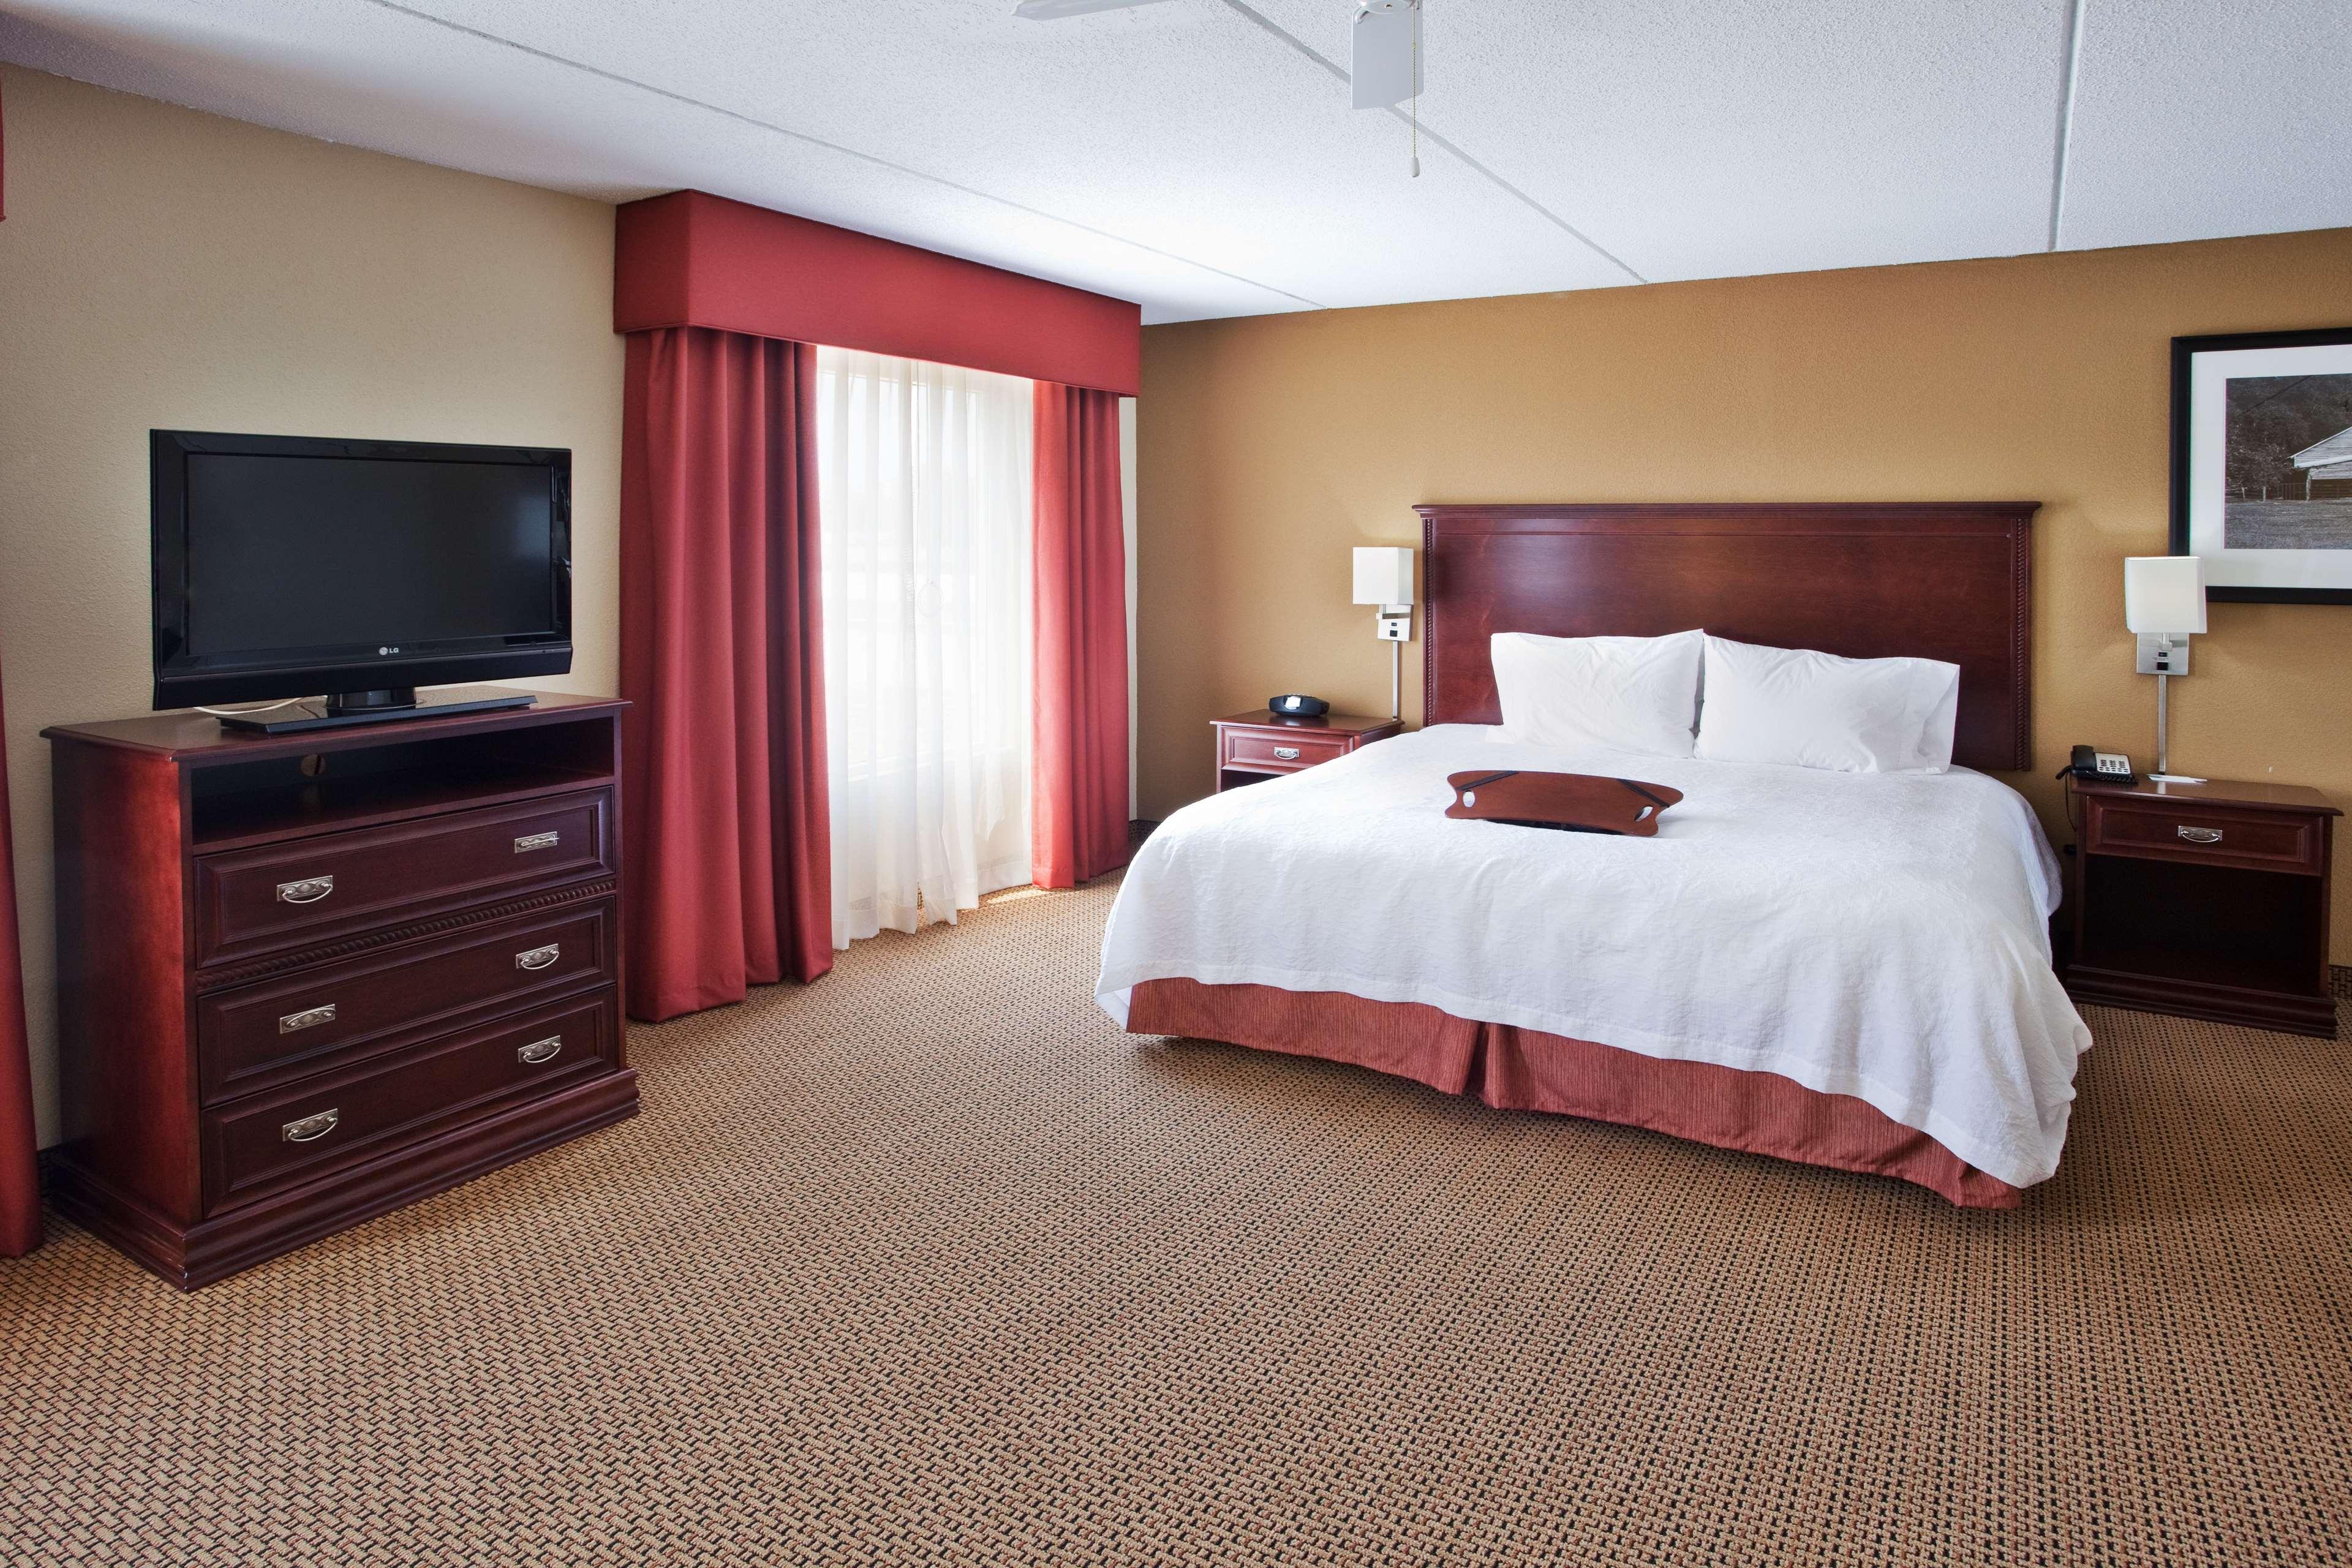 Hampton Inn & Suites Lanett-West Point image 39